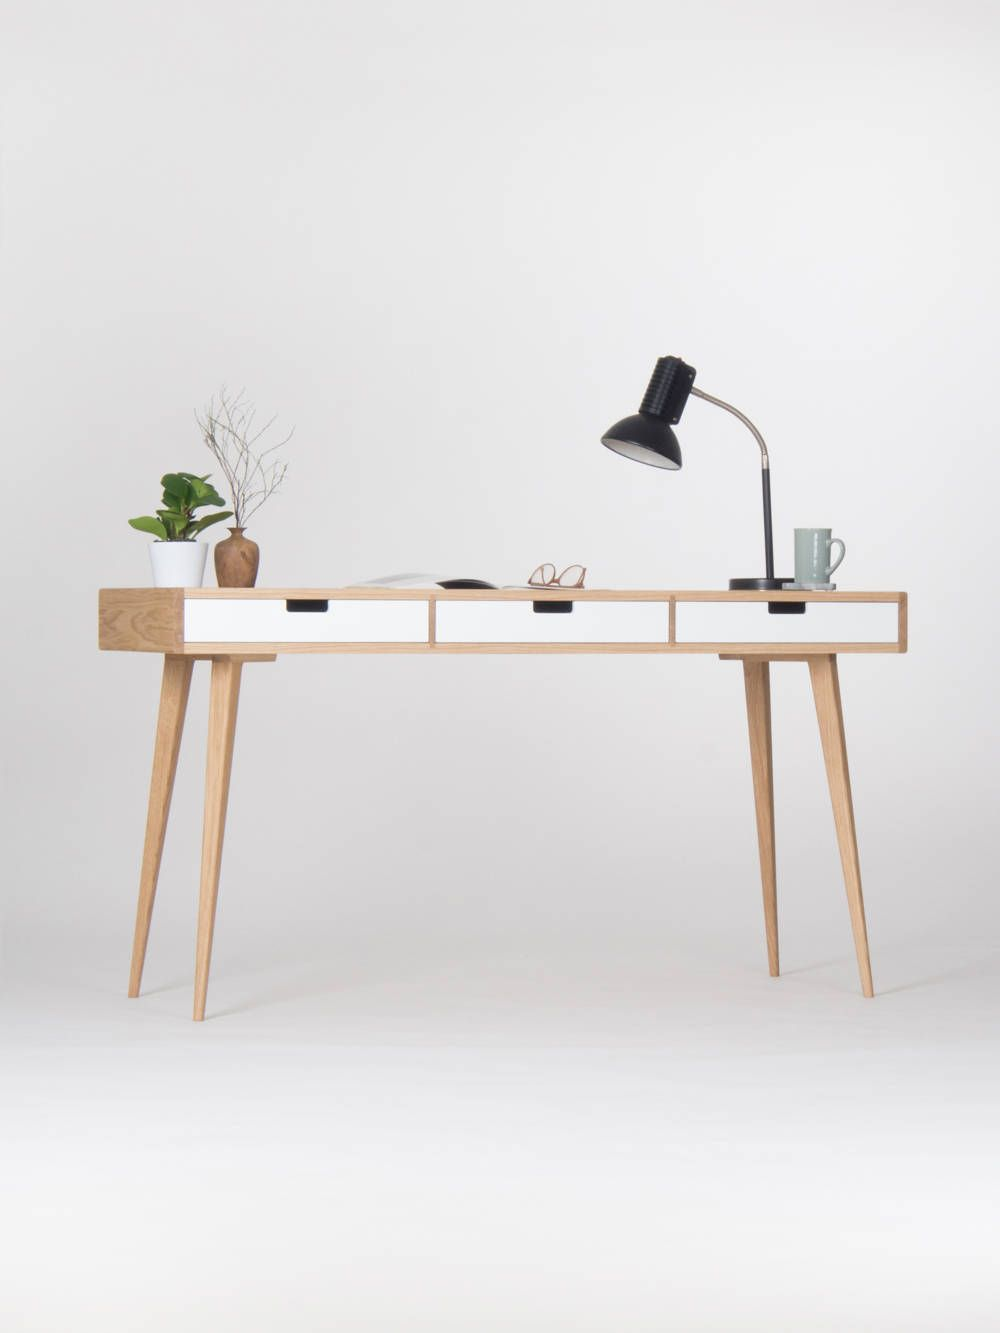 Pin By Iran Lopez On Estudio In 2020 Home Office Desks Study Desk Diy Desk